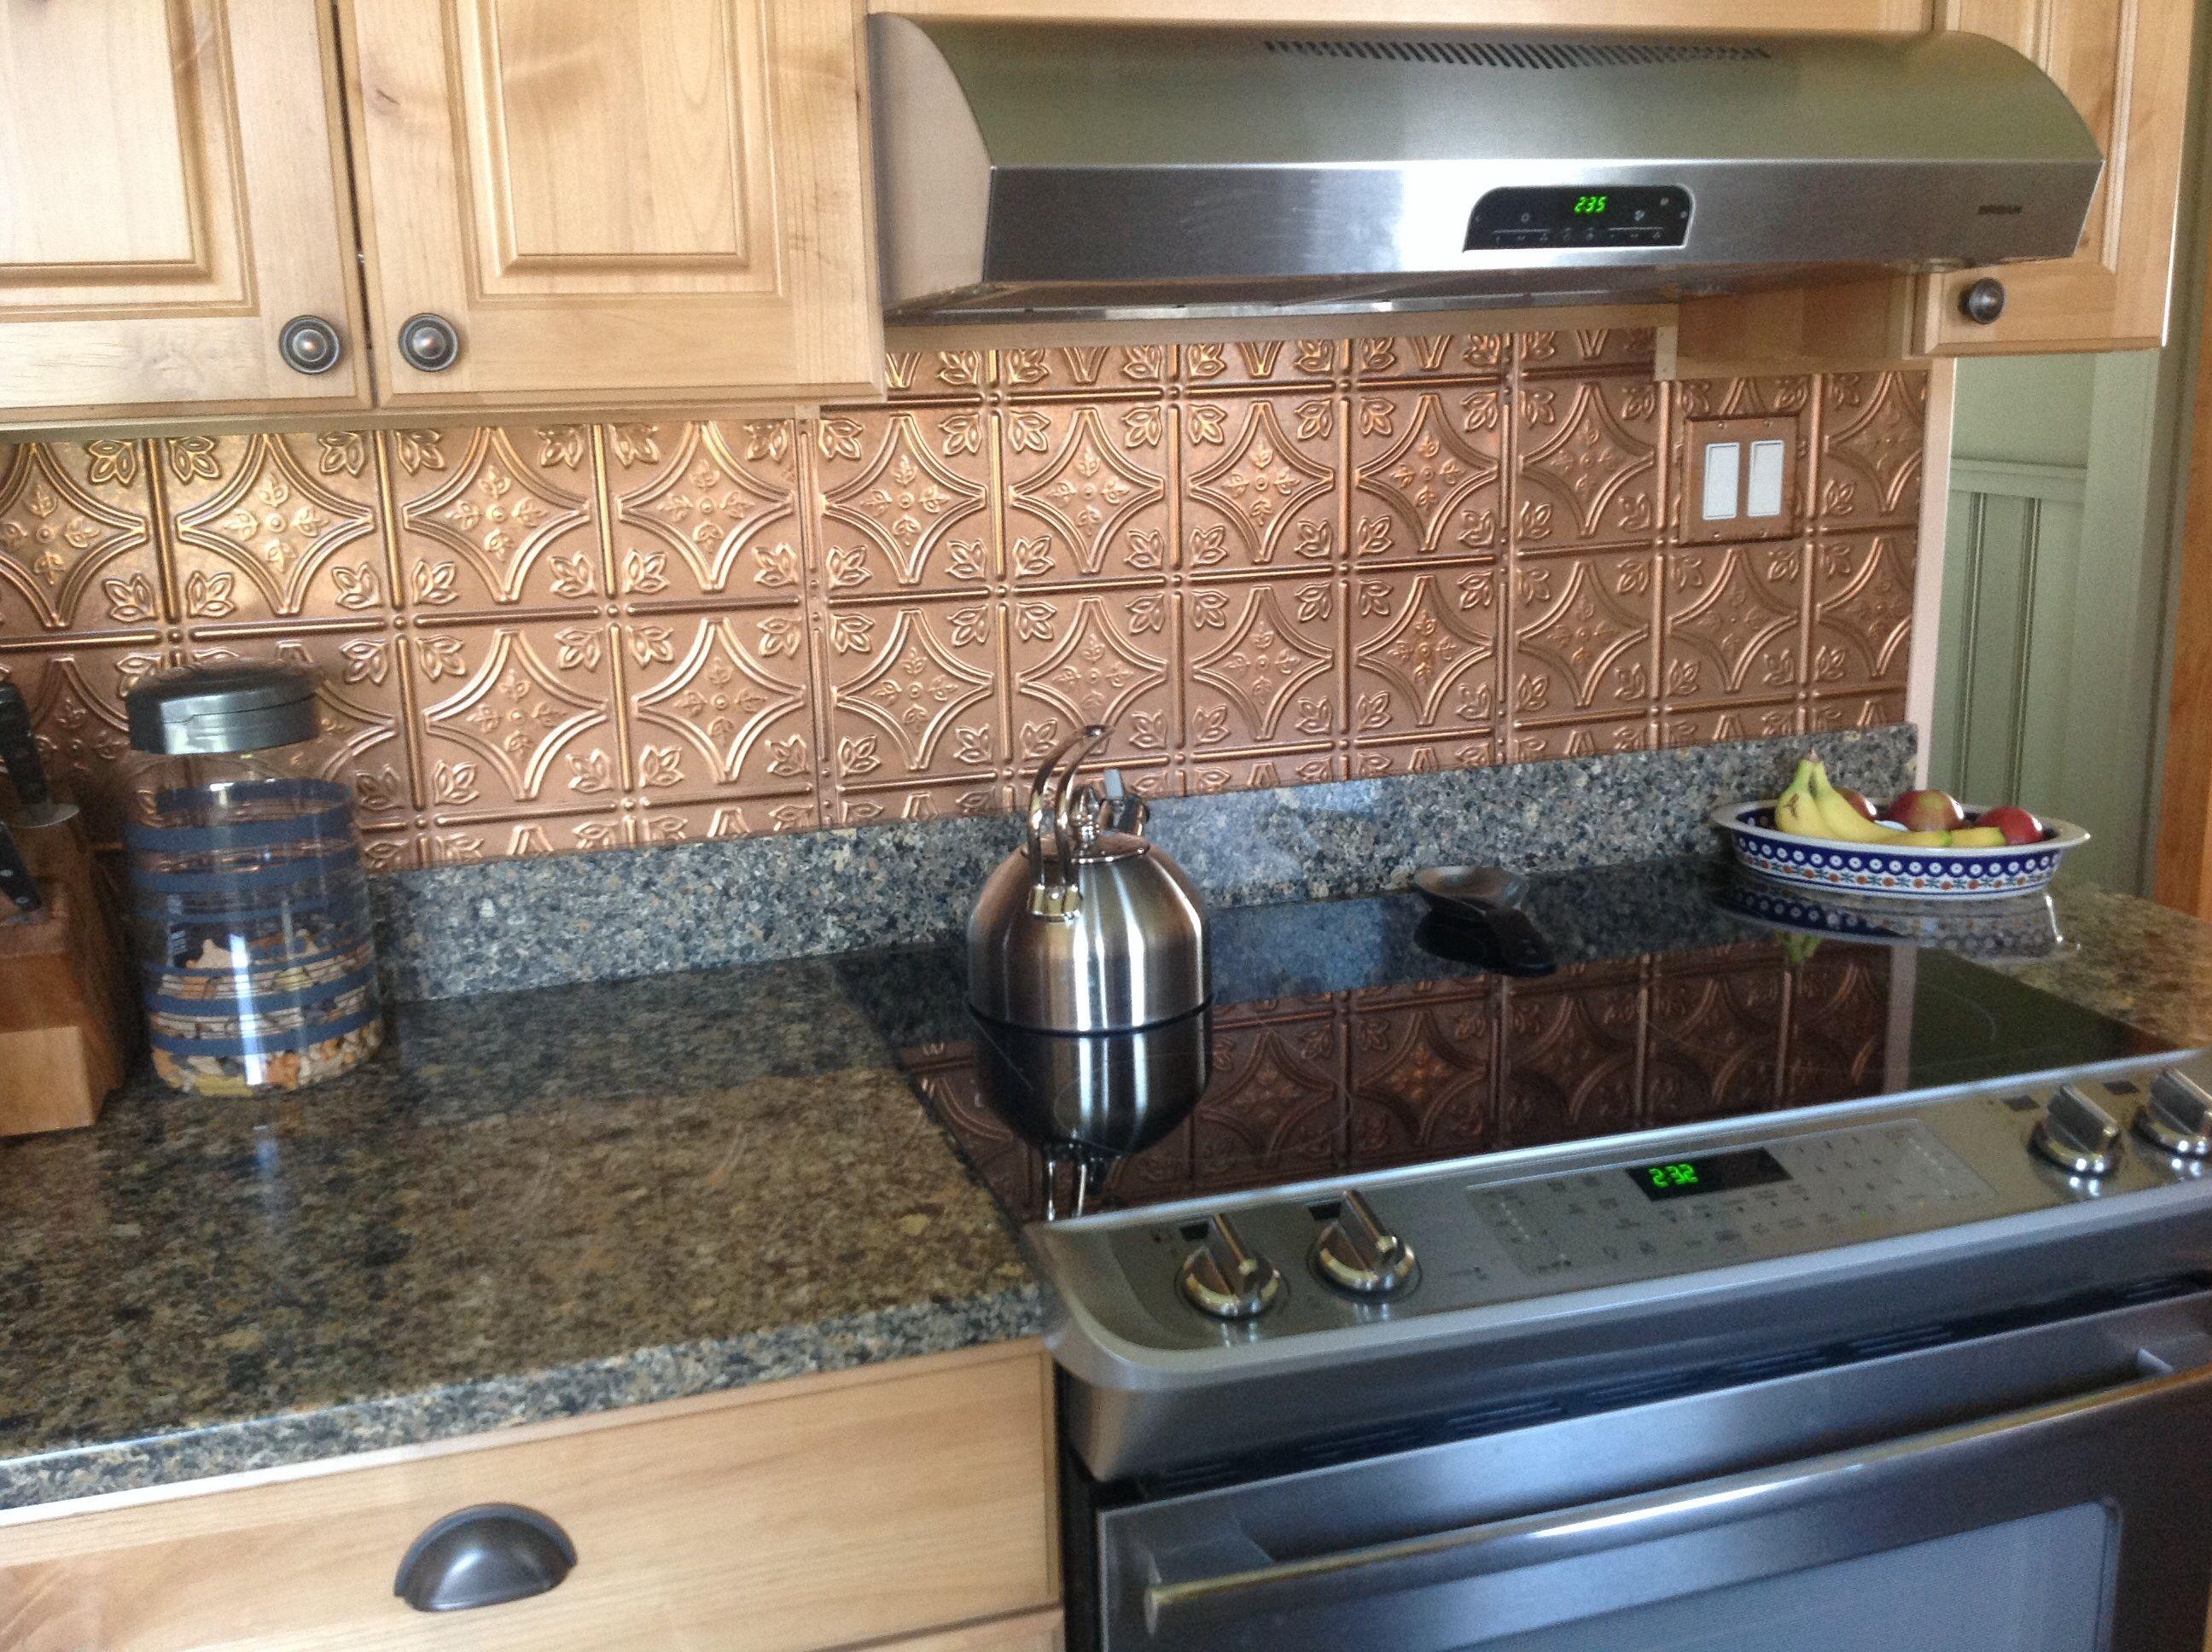 Easy Diy Kitchen Backsplashes That Cost Less Than 100 On Average Tin Tiles Http Www Am Tin Backsplash Kitchen Tin Backsplash Tin Tile Backsplash Kitchen